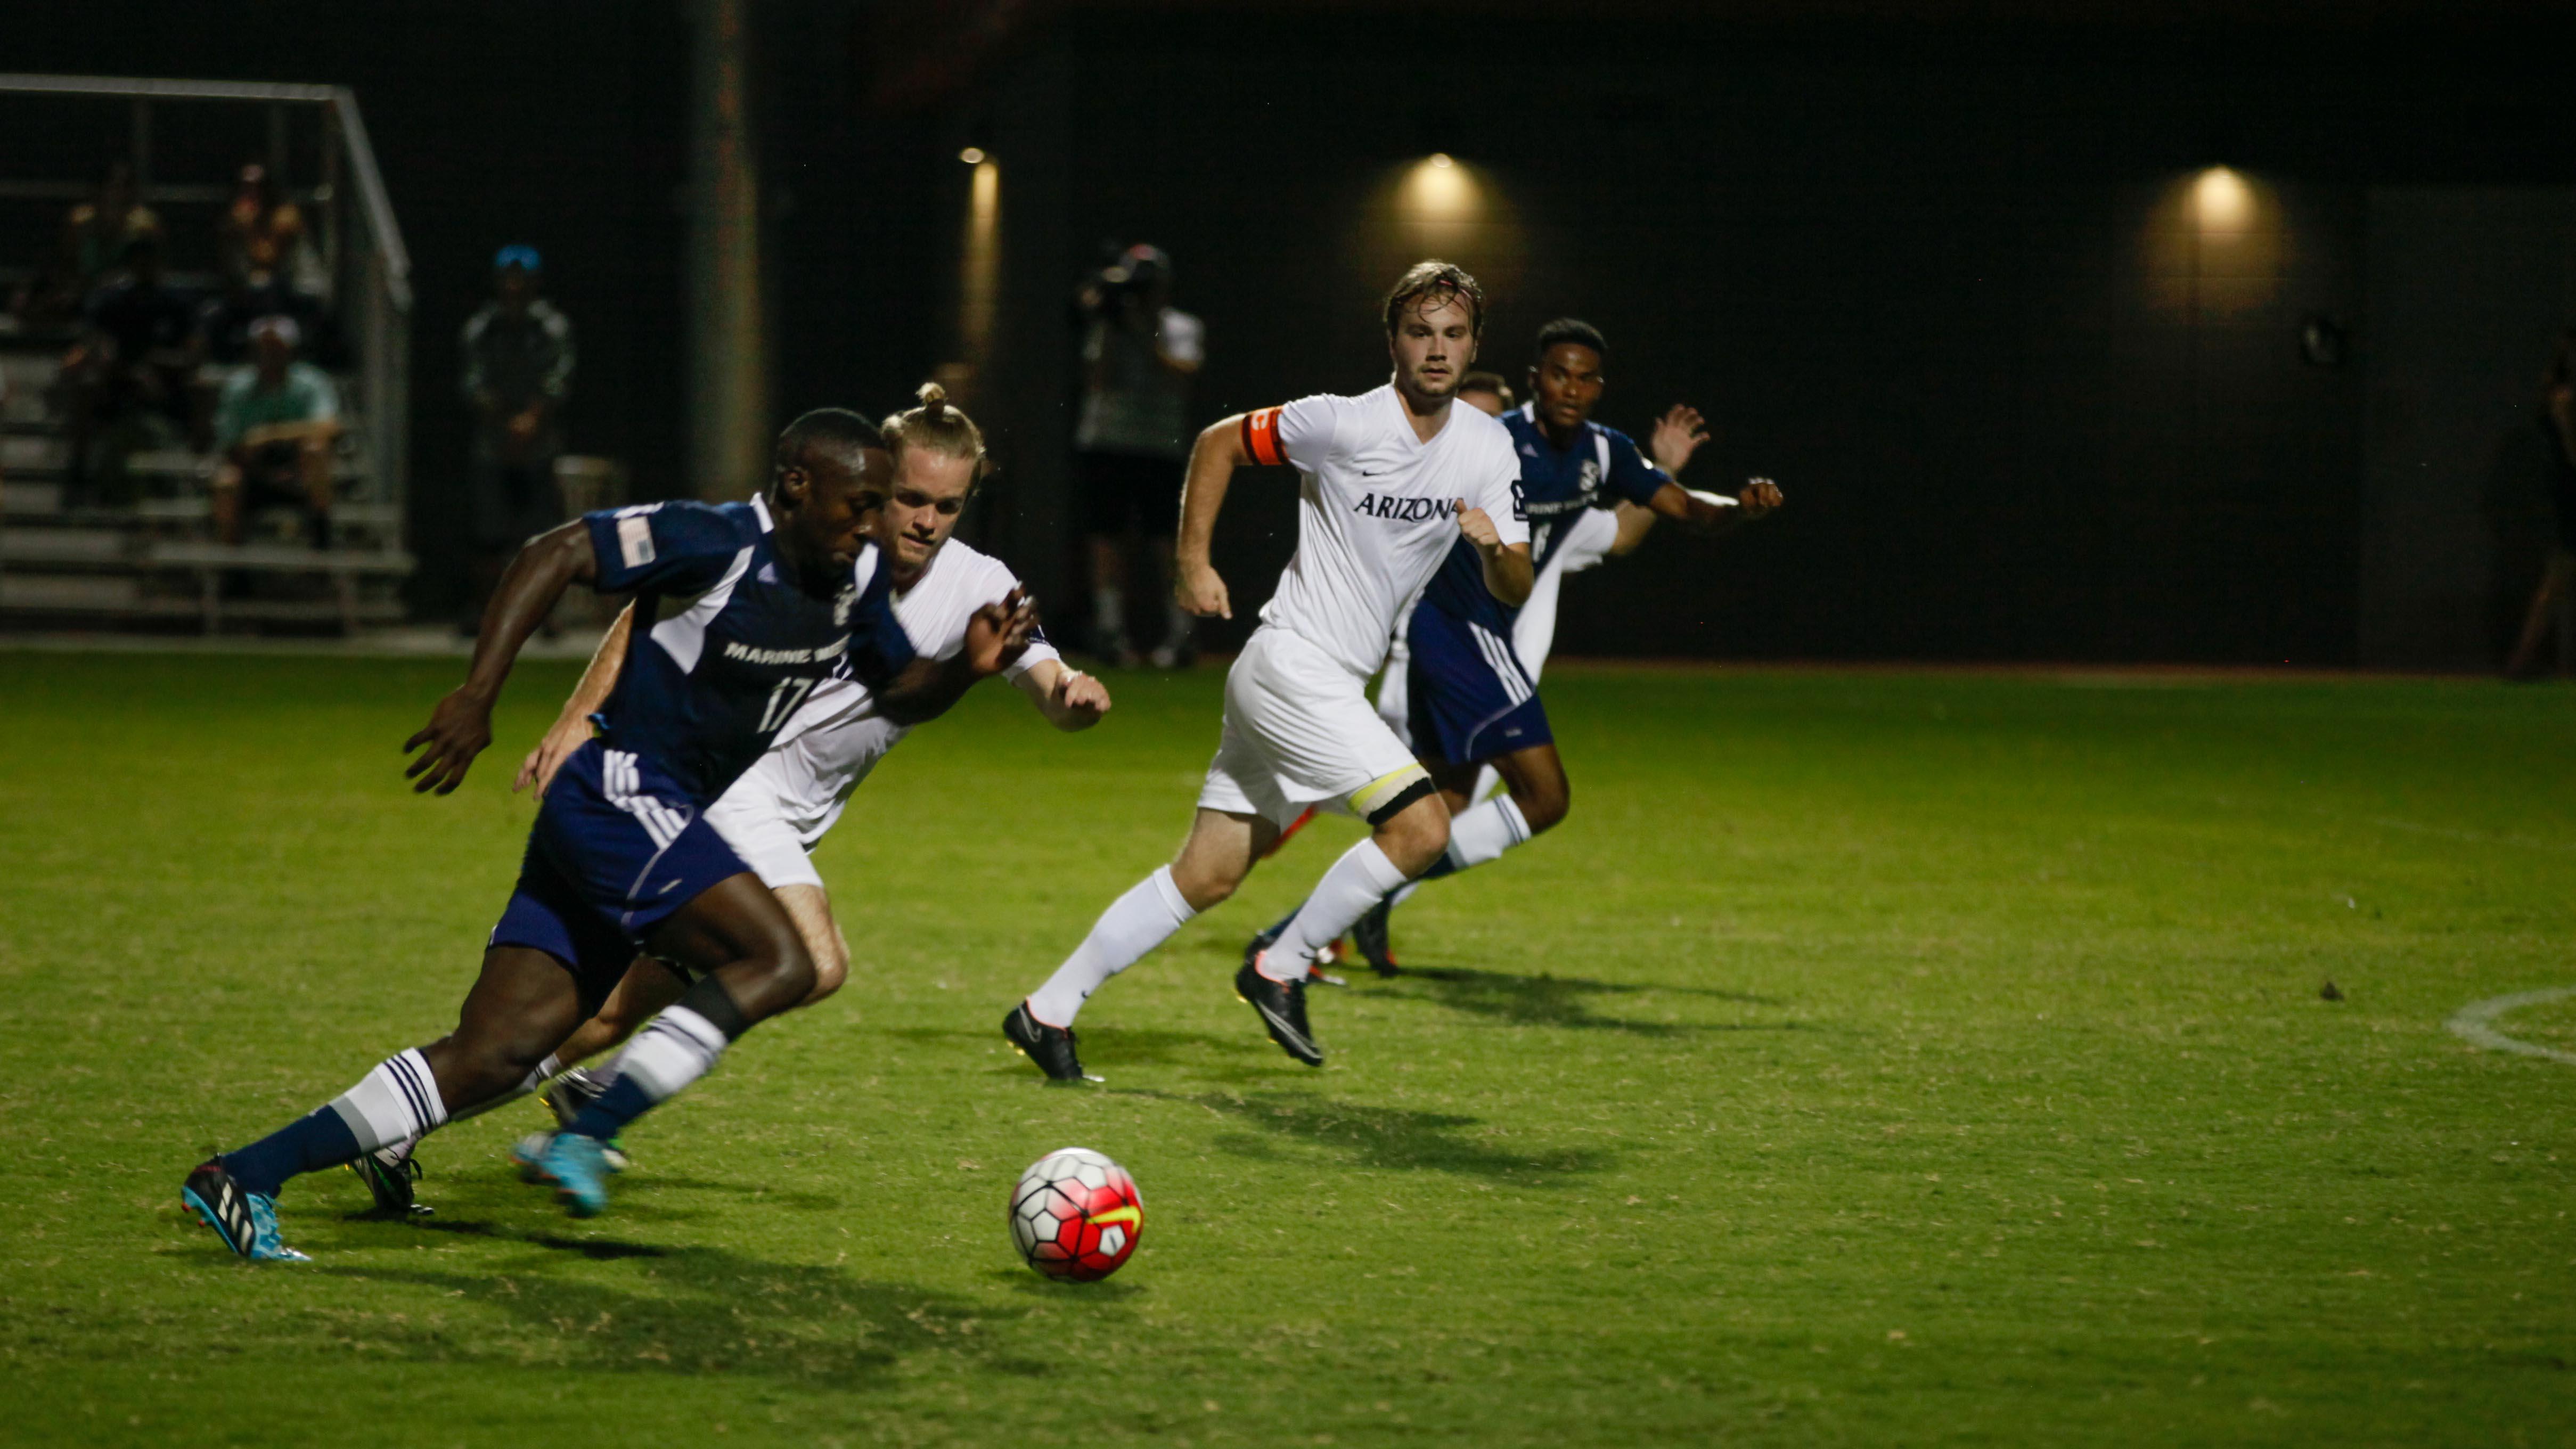 Marine Soccer Team kicks off Marine Week with soccer match ...